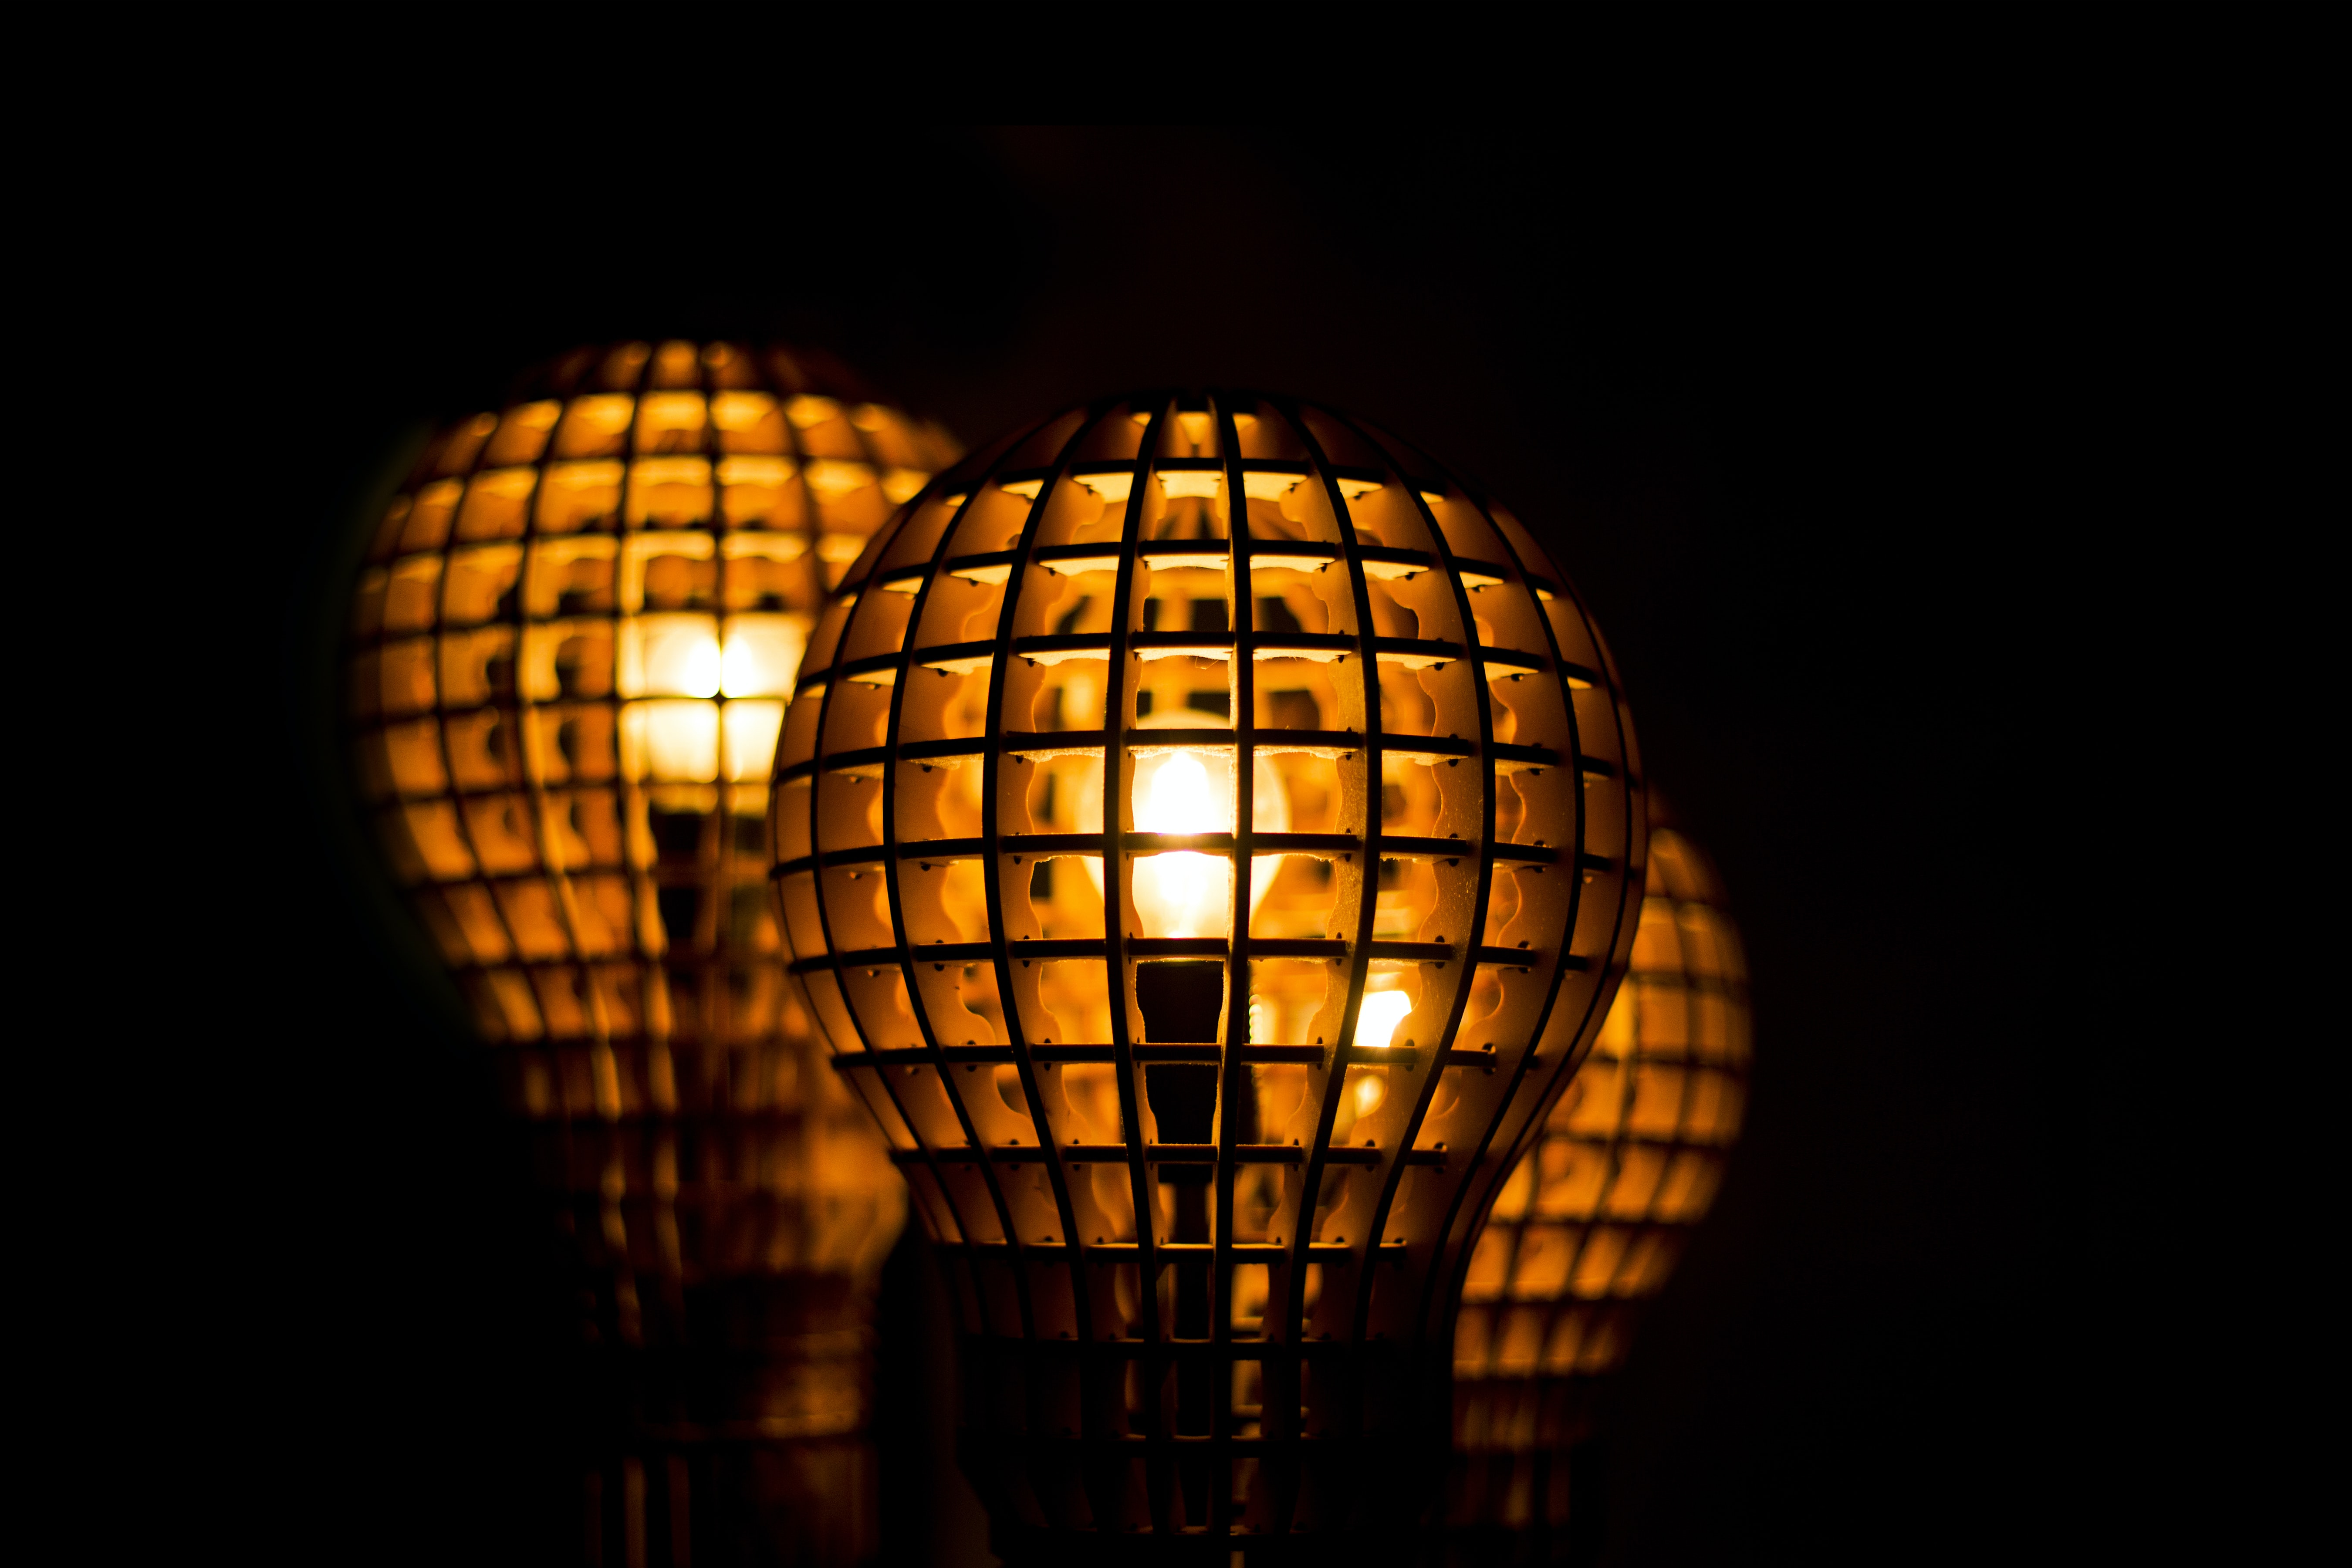 selective focus photography of lit lantern